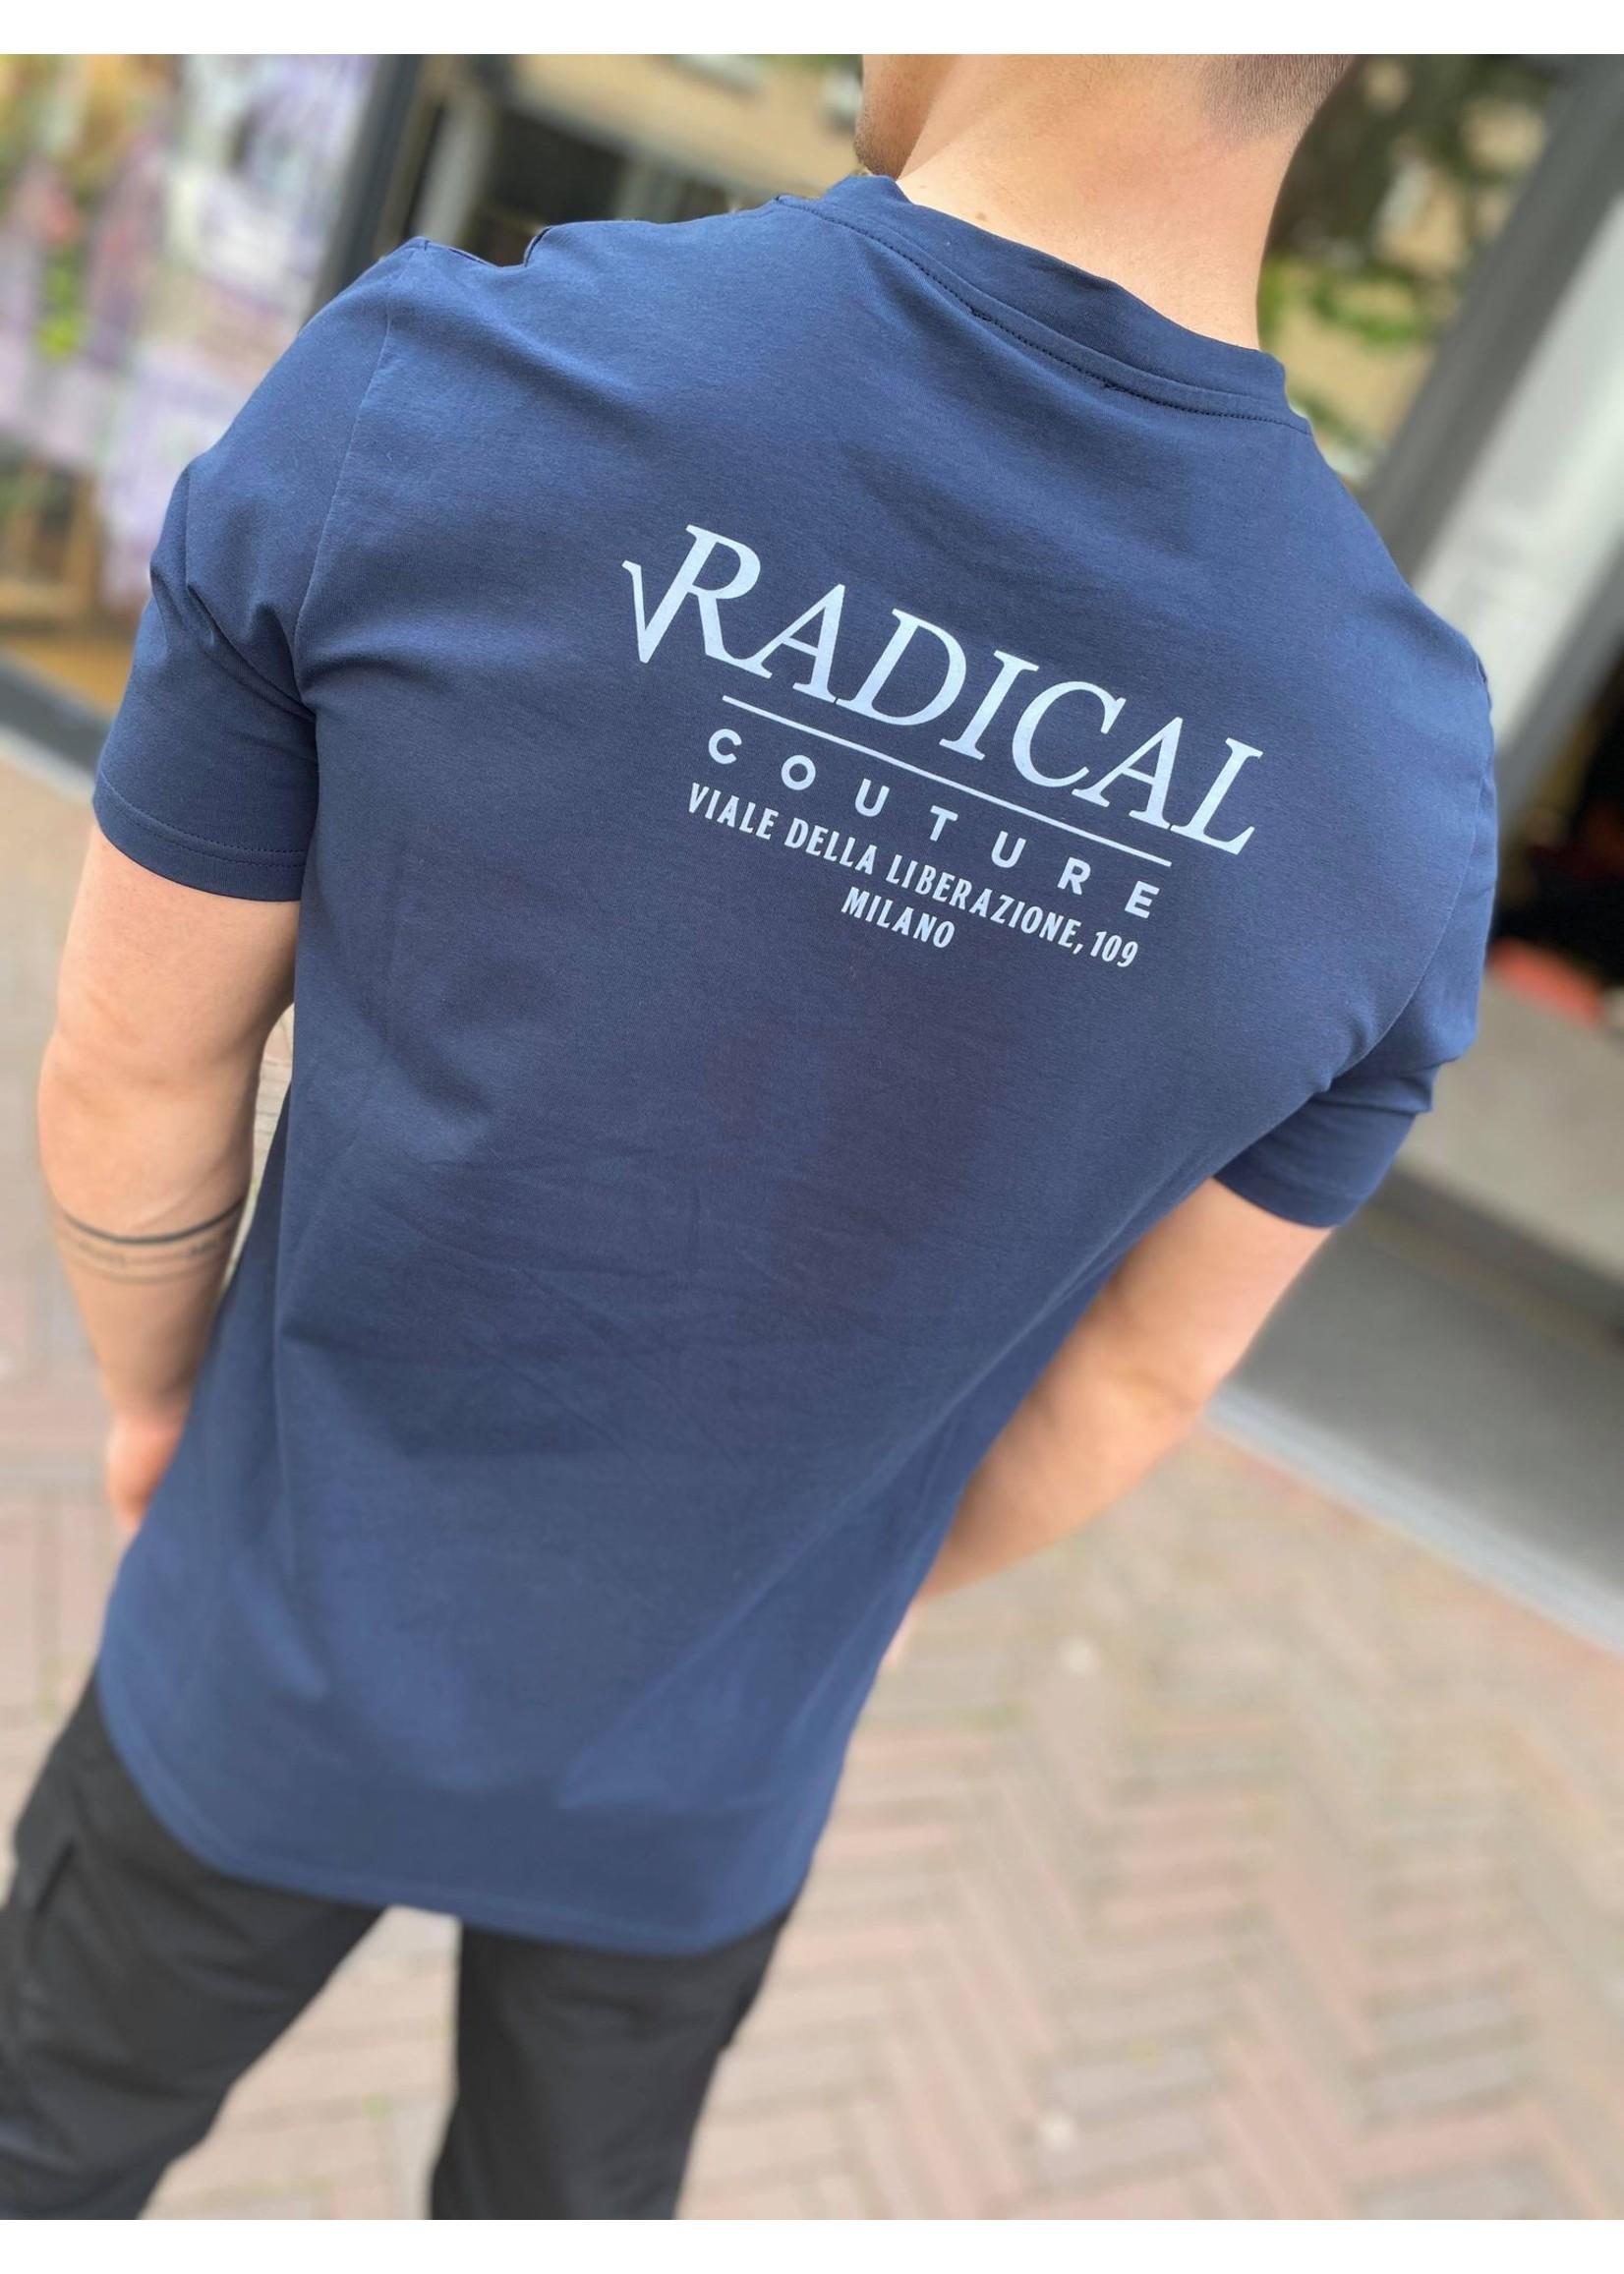 RADICAL Stallo Milano - Blue